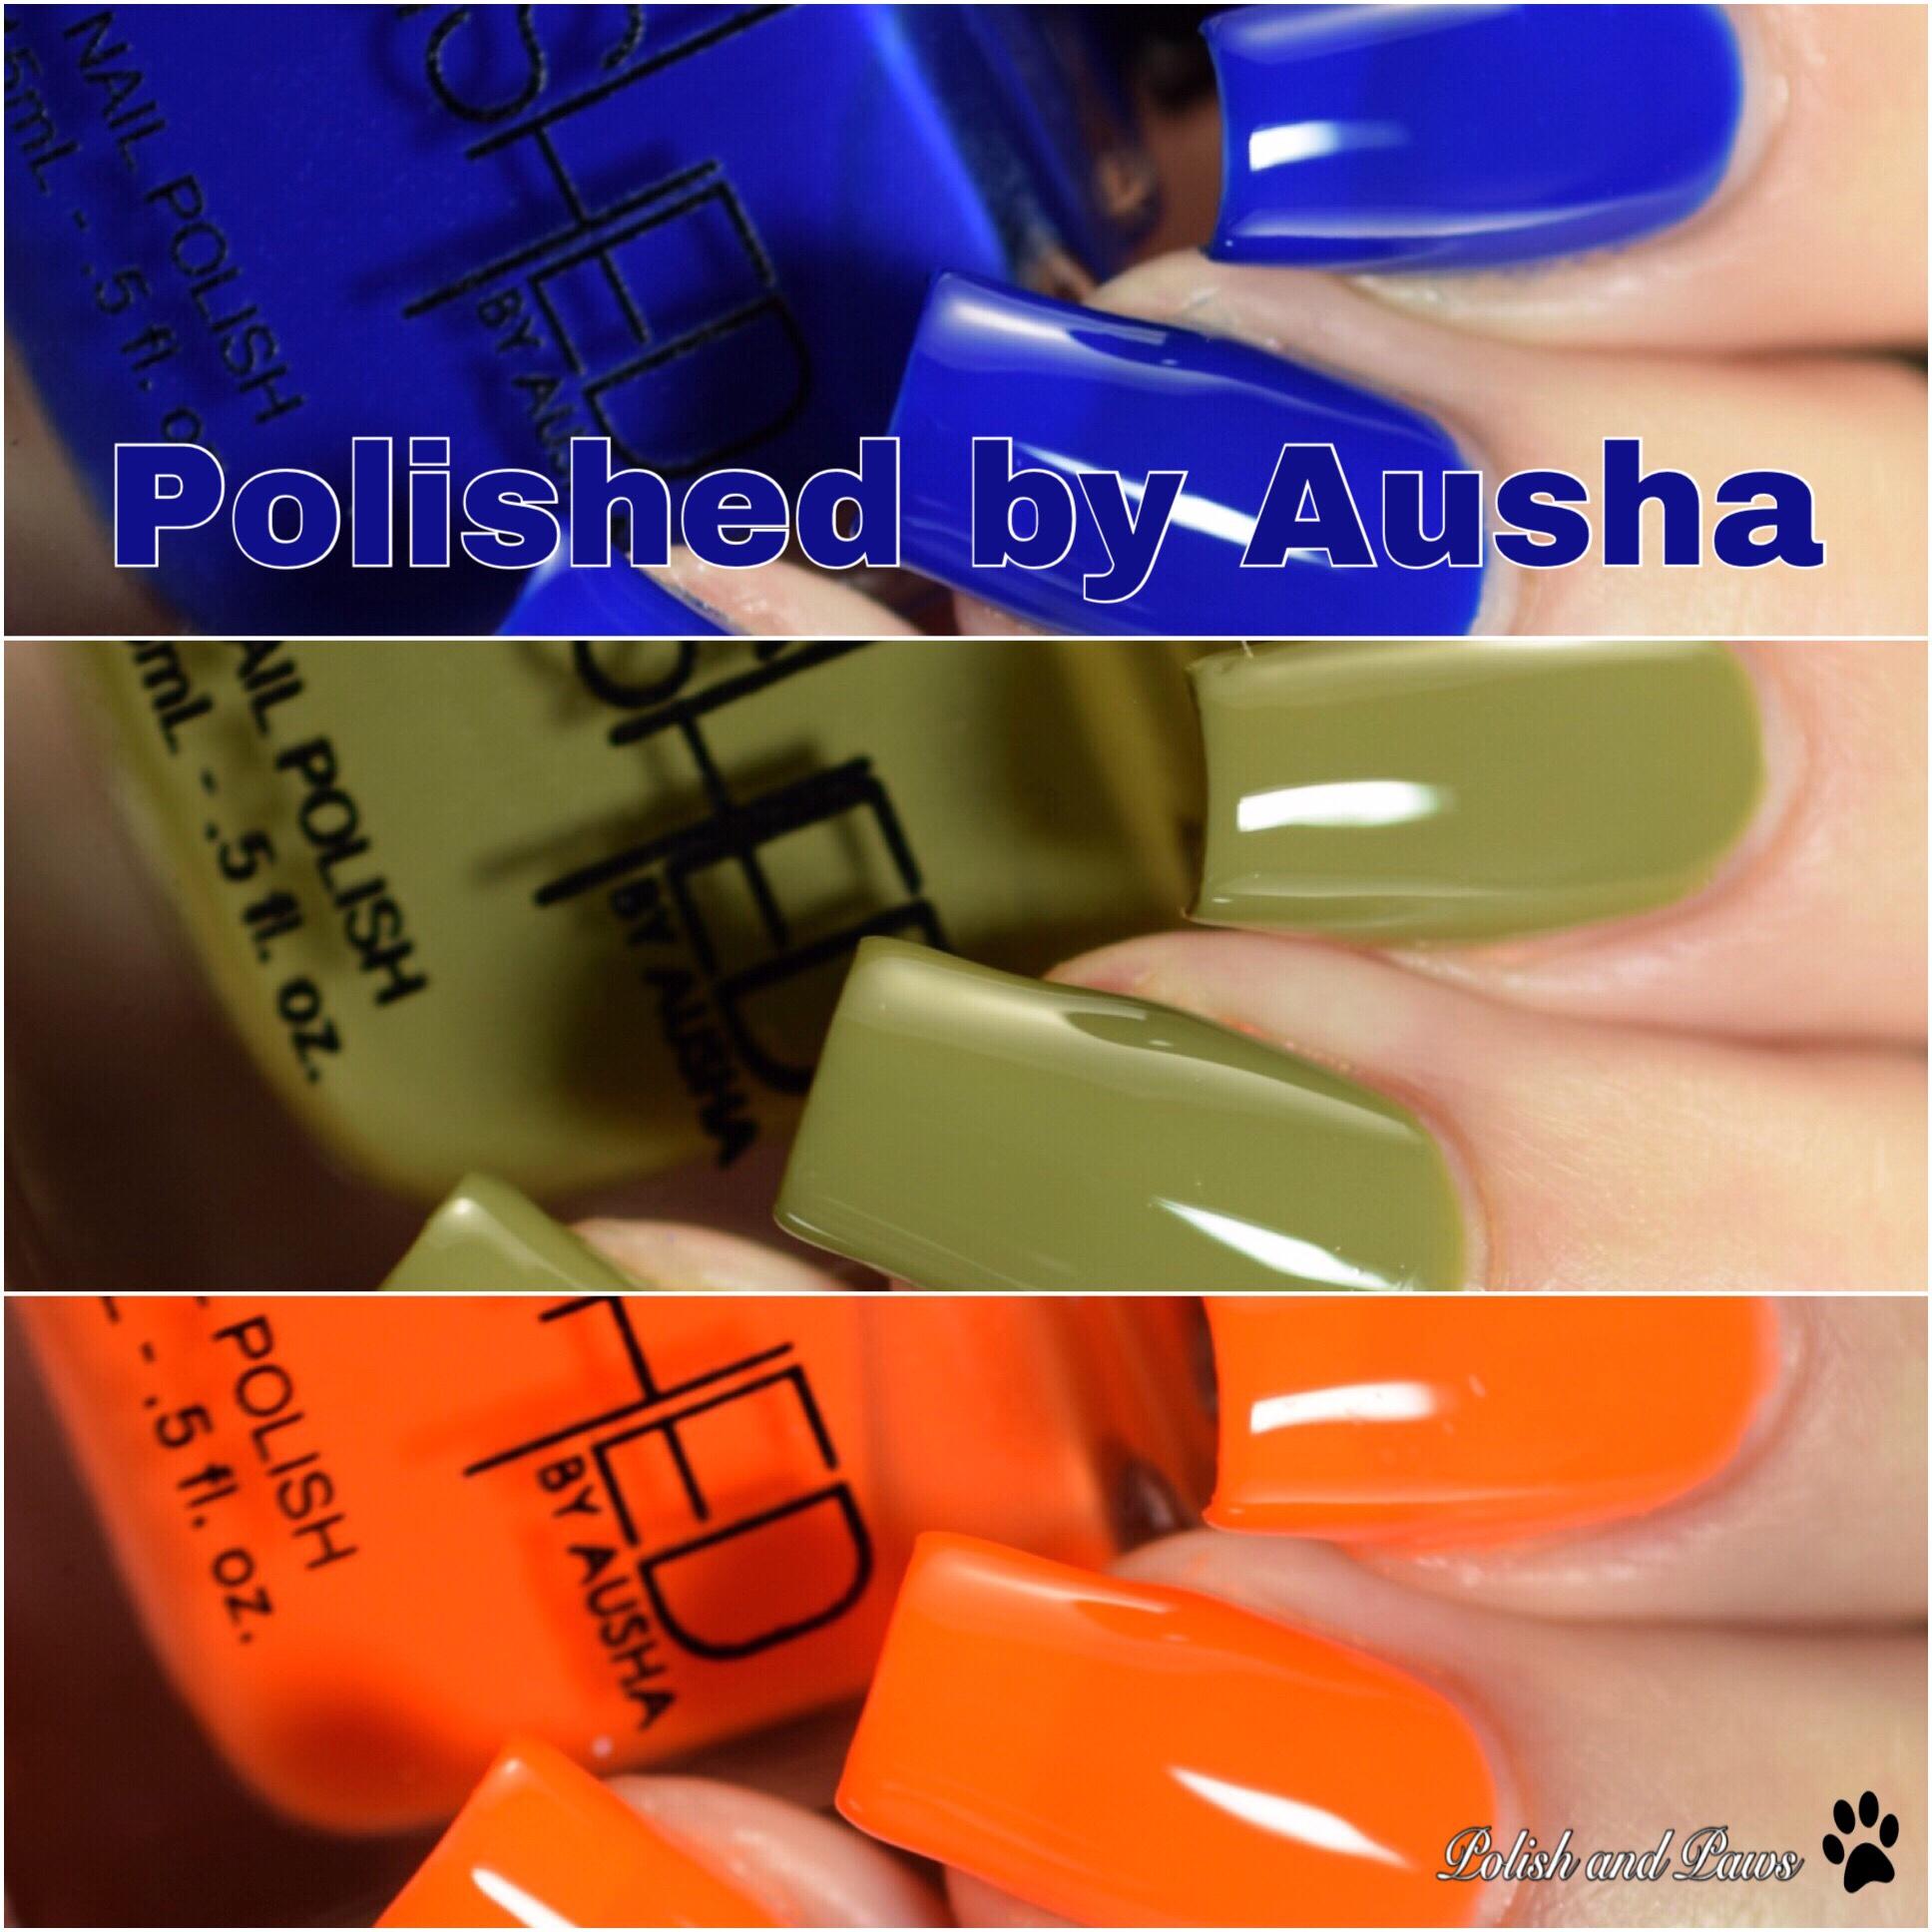 Polished by Ausha